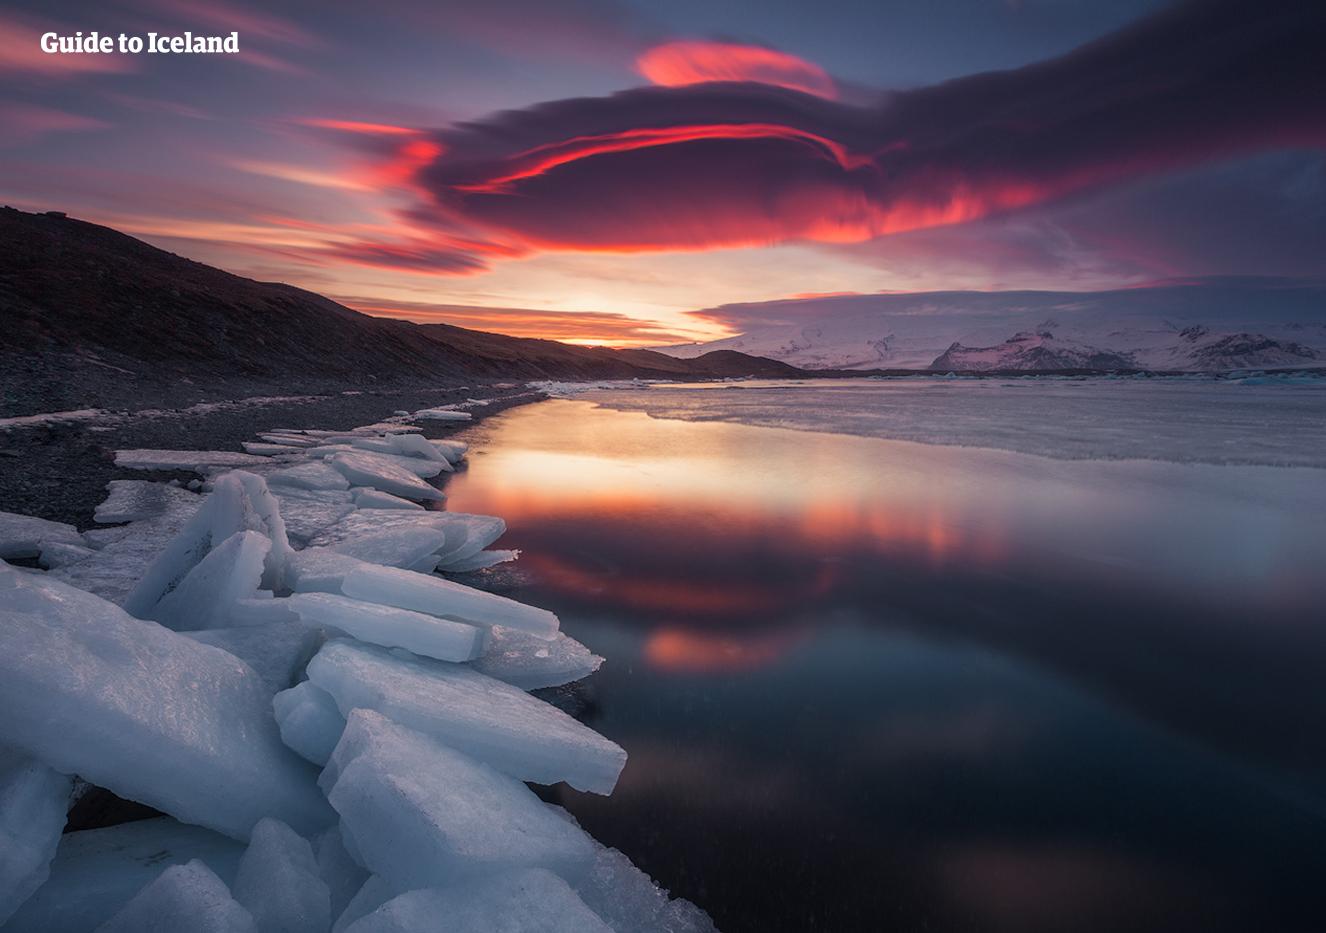 Den røde aftenhimmel spejler sig i den stille Jökulsárlón-gletsjerlagune.